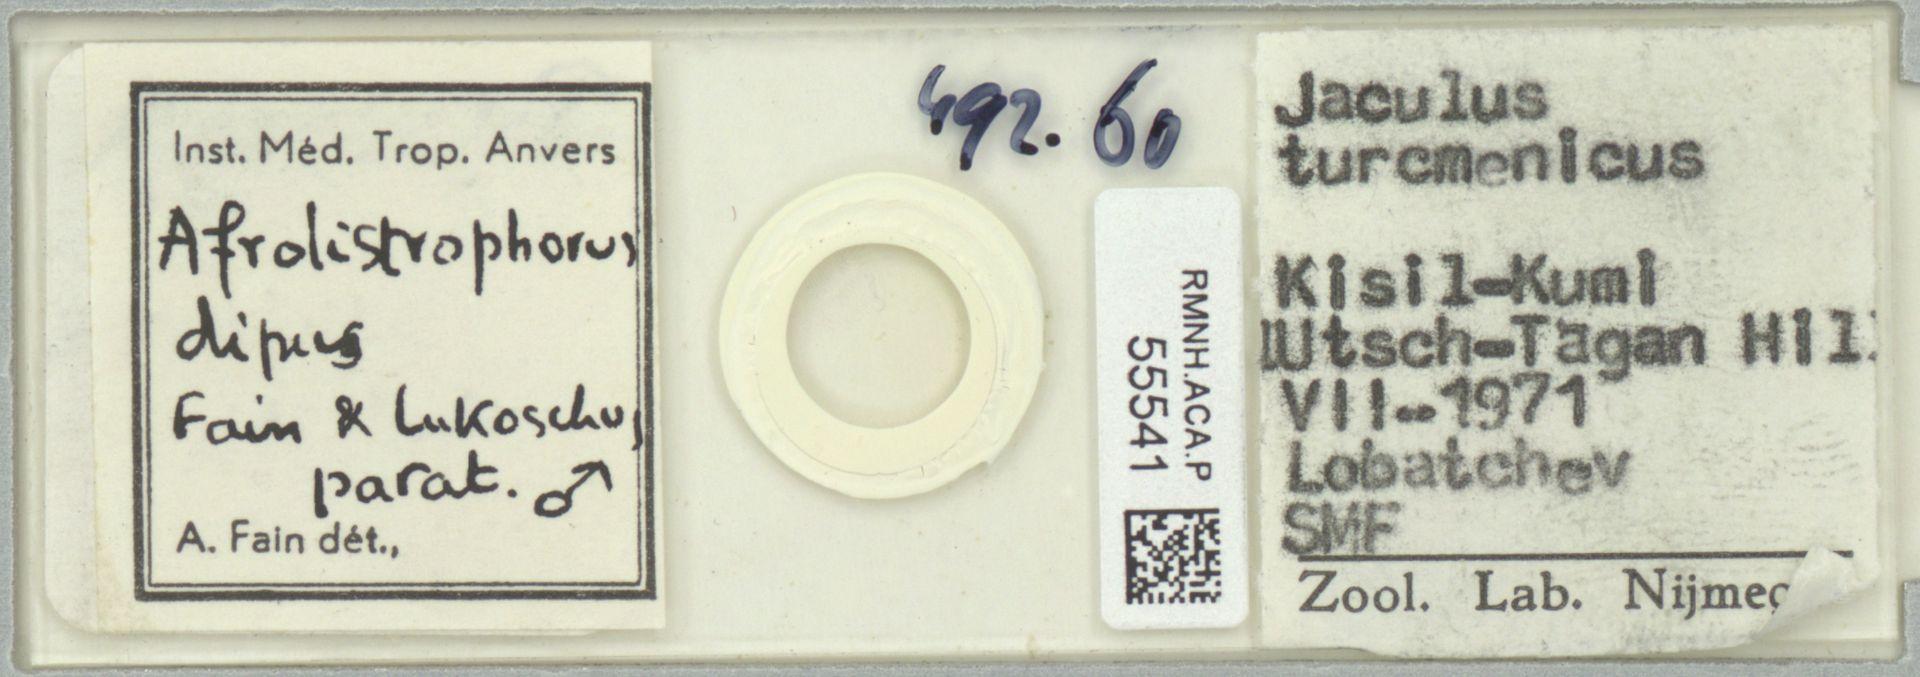 RMNH.ACA.P.55541 | Afrolistrophorus dipus Fain & Lukoschus